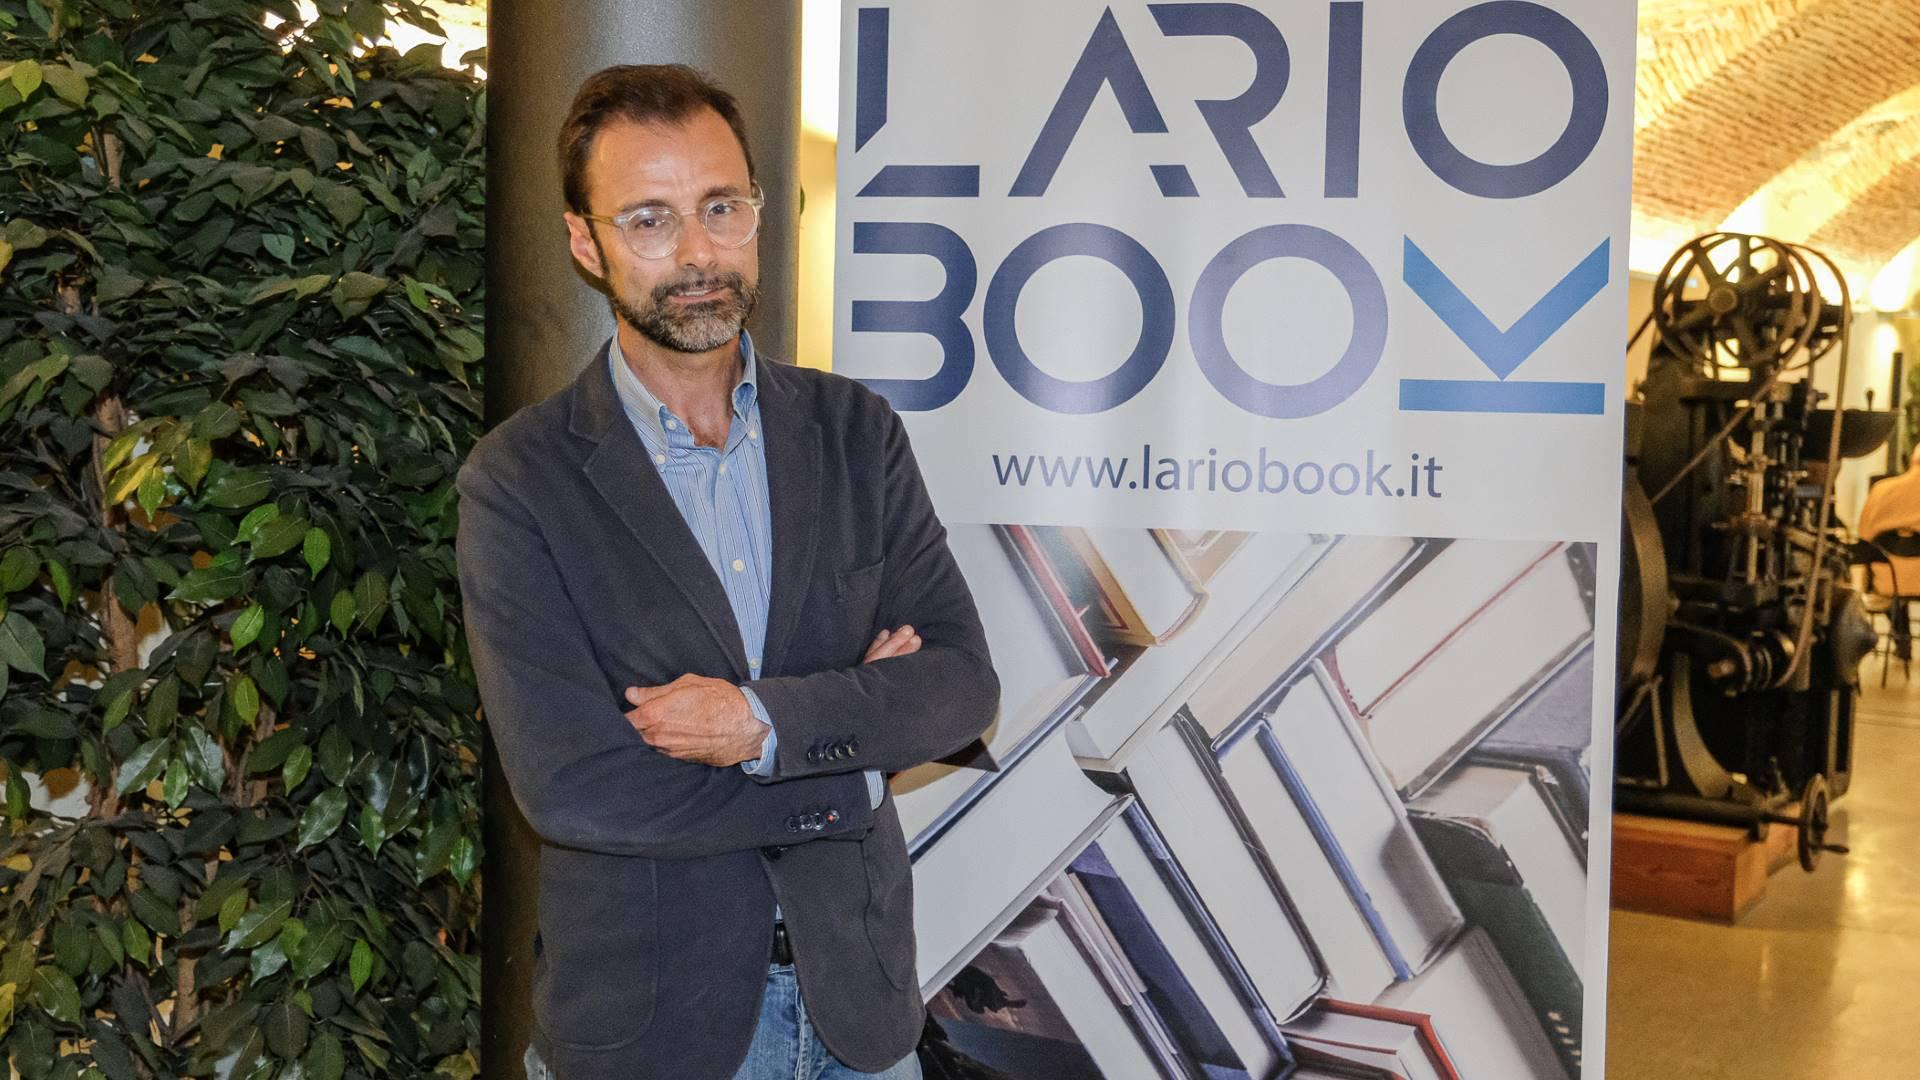 Francesco Specchia